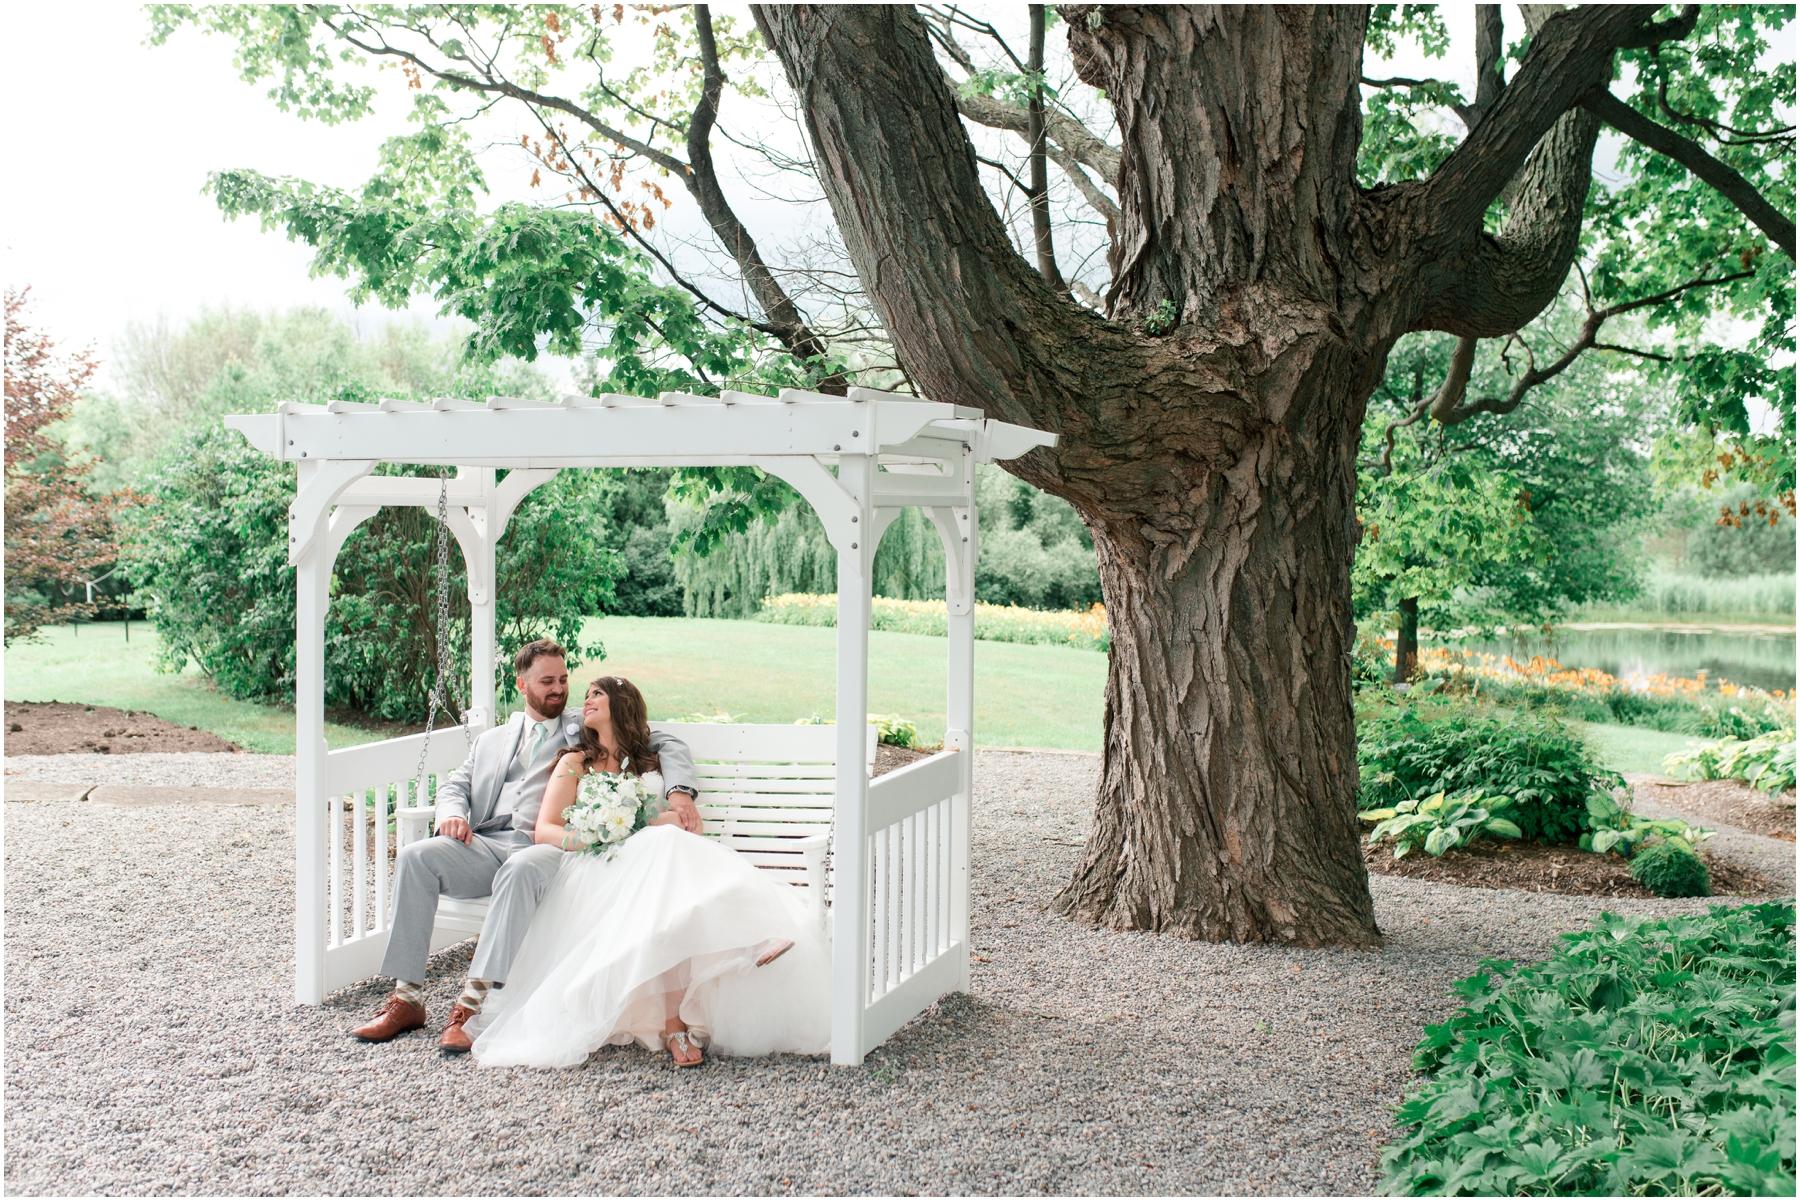 Bloom Field Gardens Wedding Precious Photography_0342